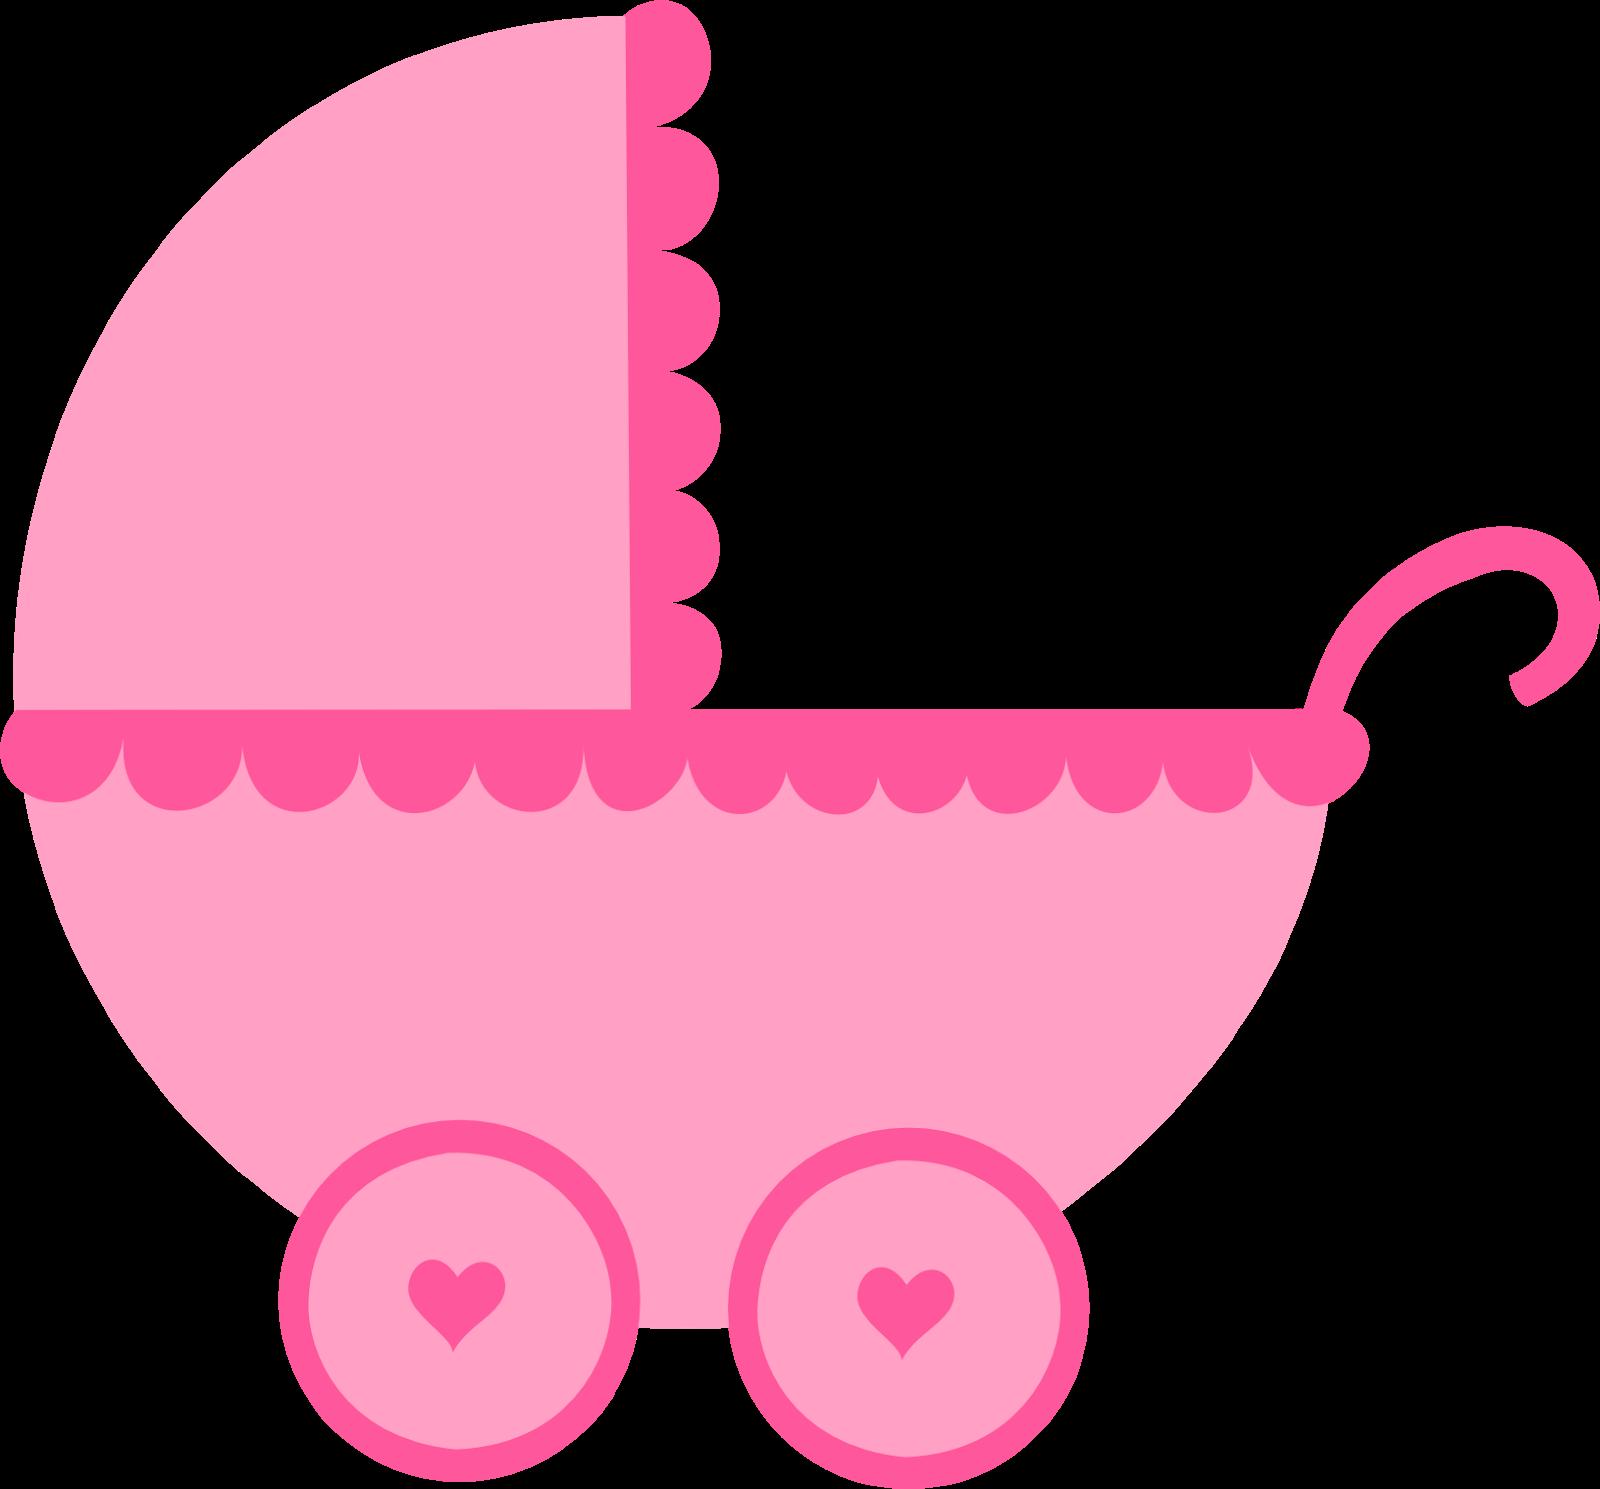 Carrinho Bebe Png 1 600 1 489 Pixels Baby Shower Clipart Invitaciones Baby Shower Baby Boy Shower